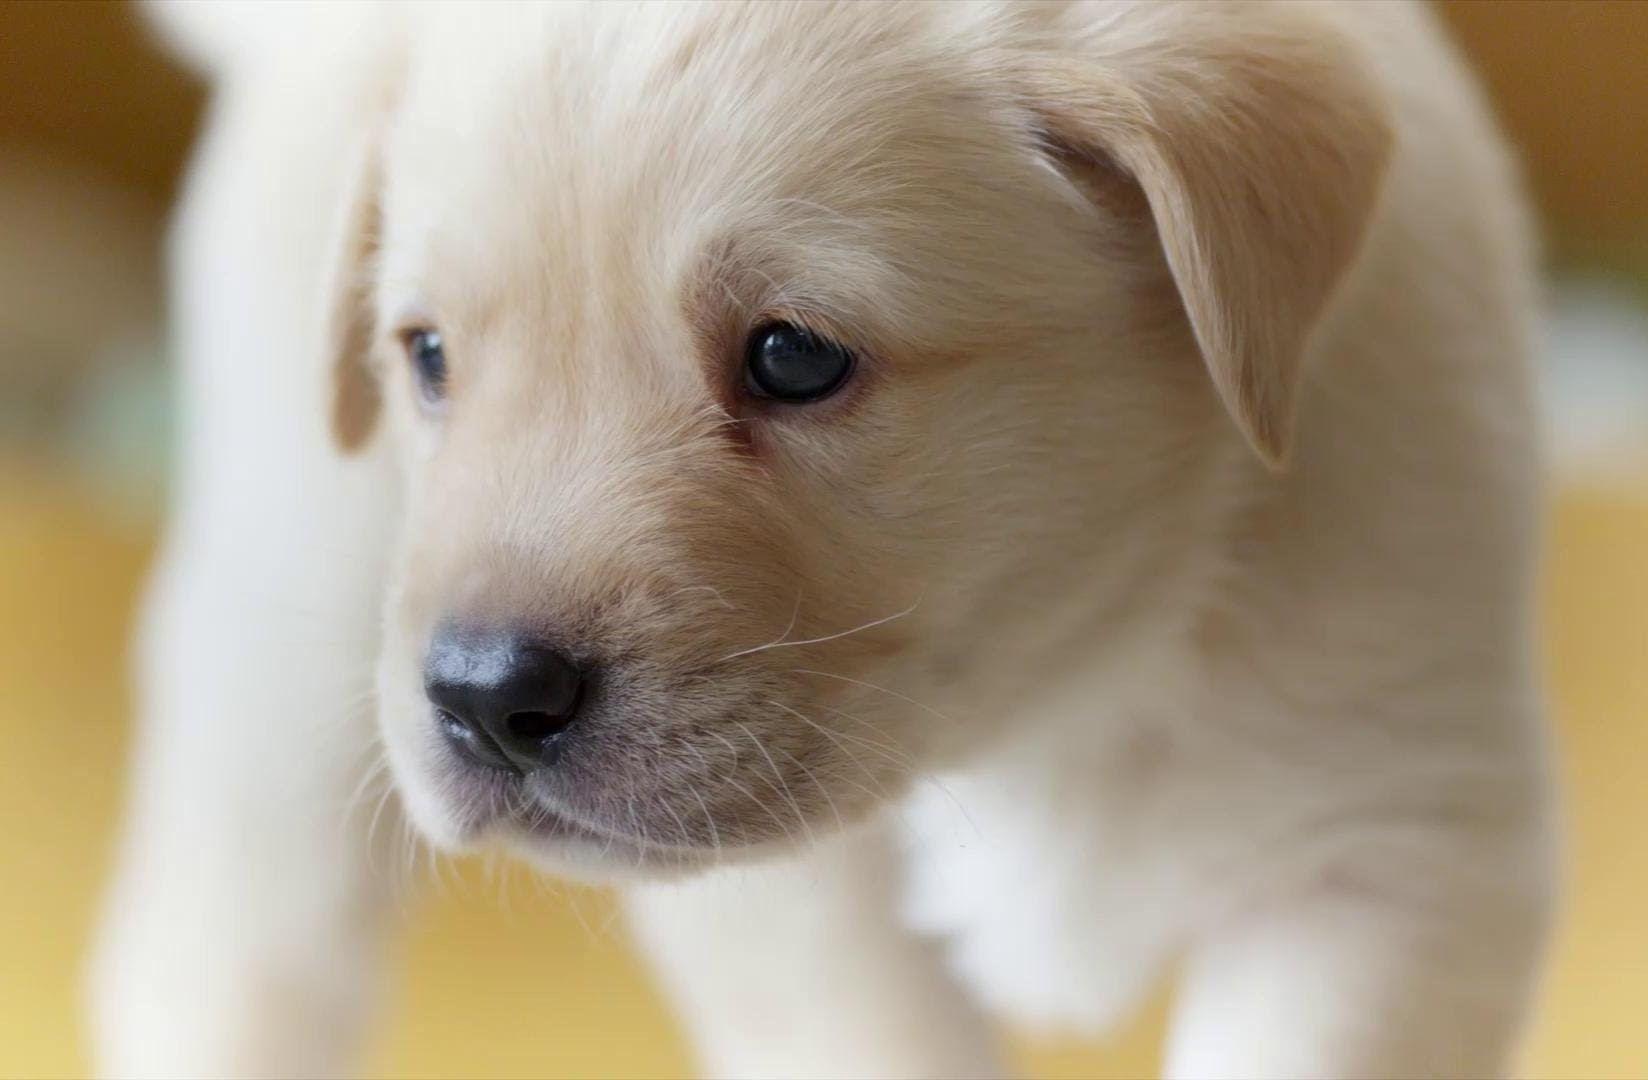 Puppy Cutedog Cutedogs Fordirtydogs Organicdogshampoo Dogshampoo Doggrooming Mansbestfriend Dog Dogs Secret Life Of Dogs Indoor Dog Kennel Indoor Dog